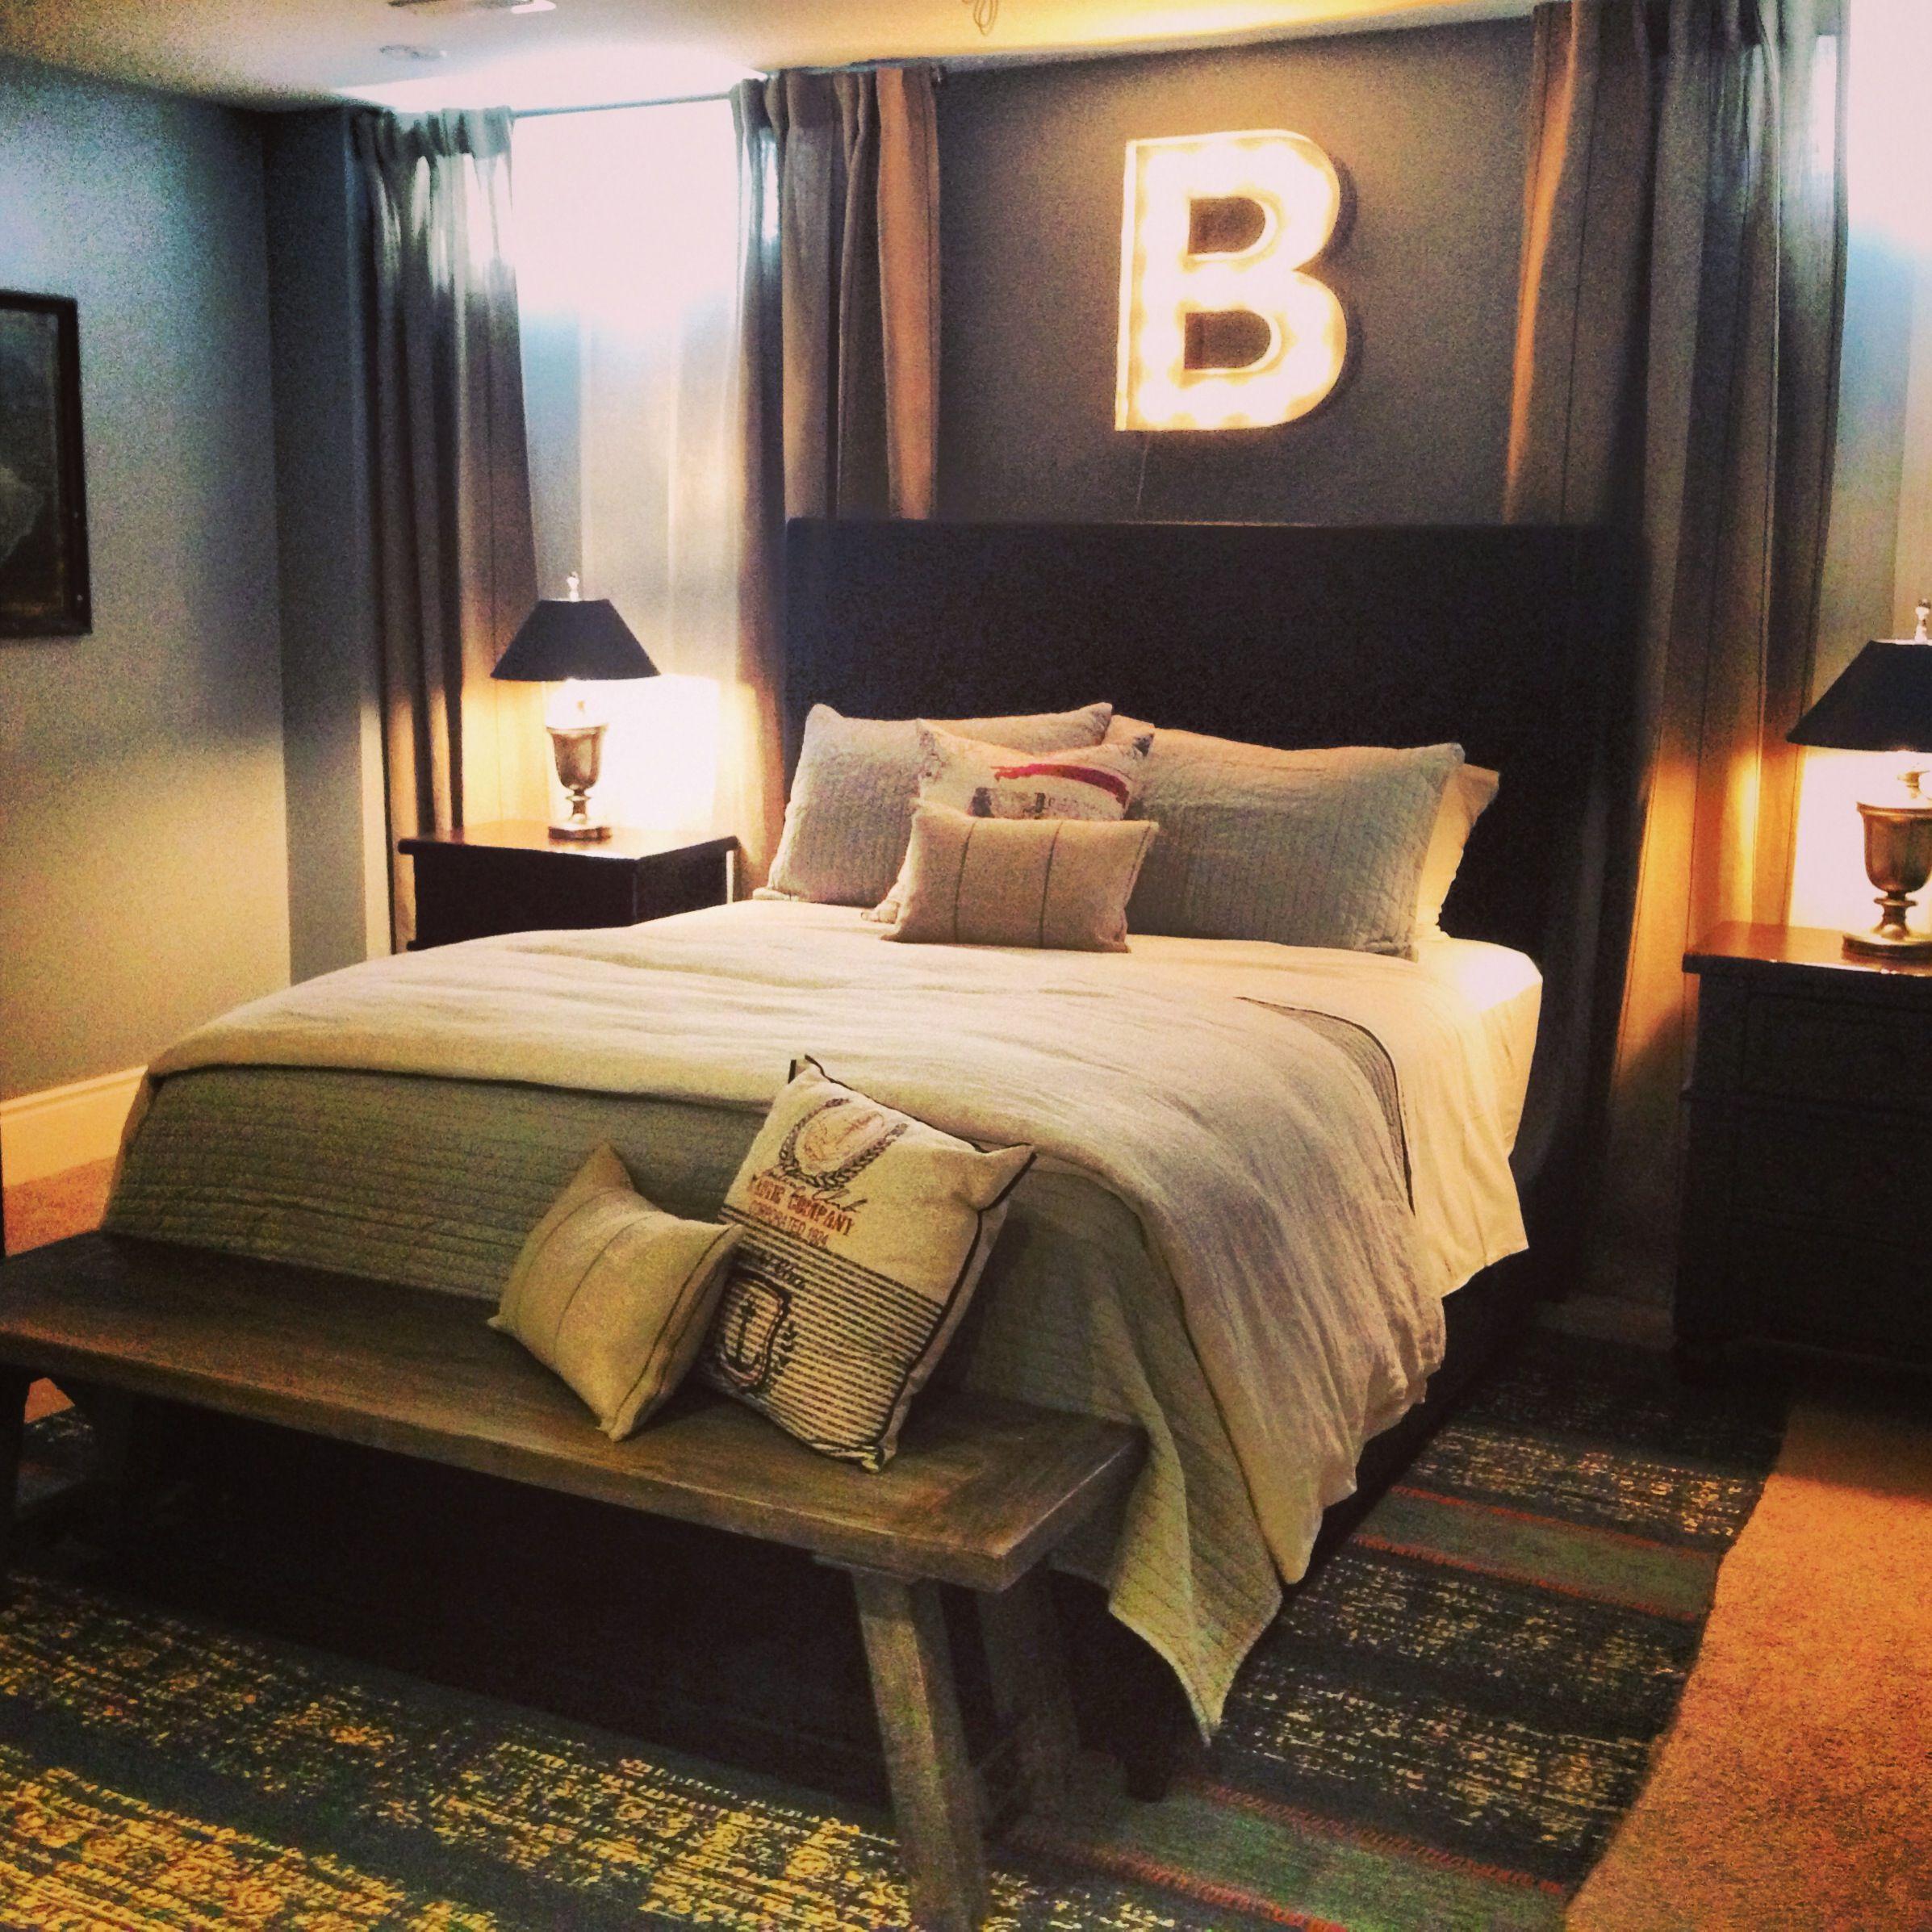 Under loft bed lighting ideas   Best Boys Bedrooms Designs Ideas and Decor Inspiration